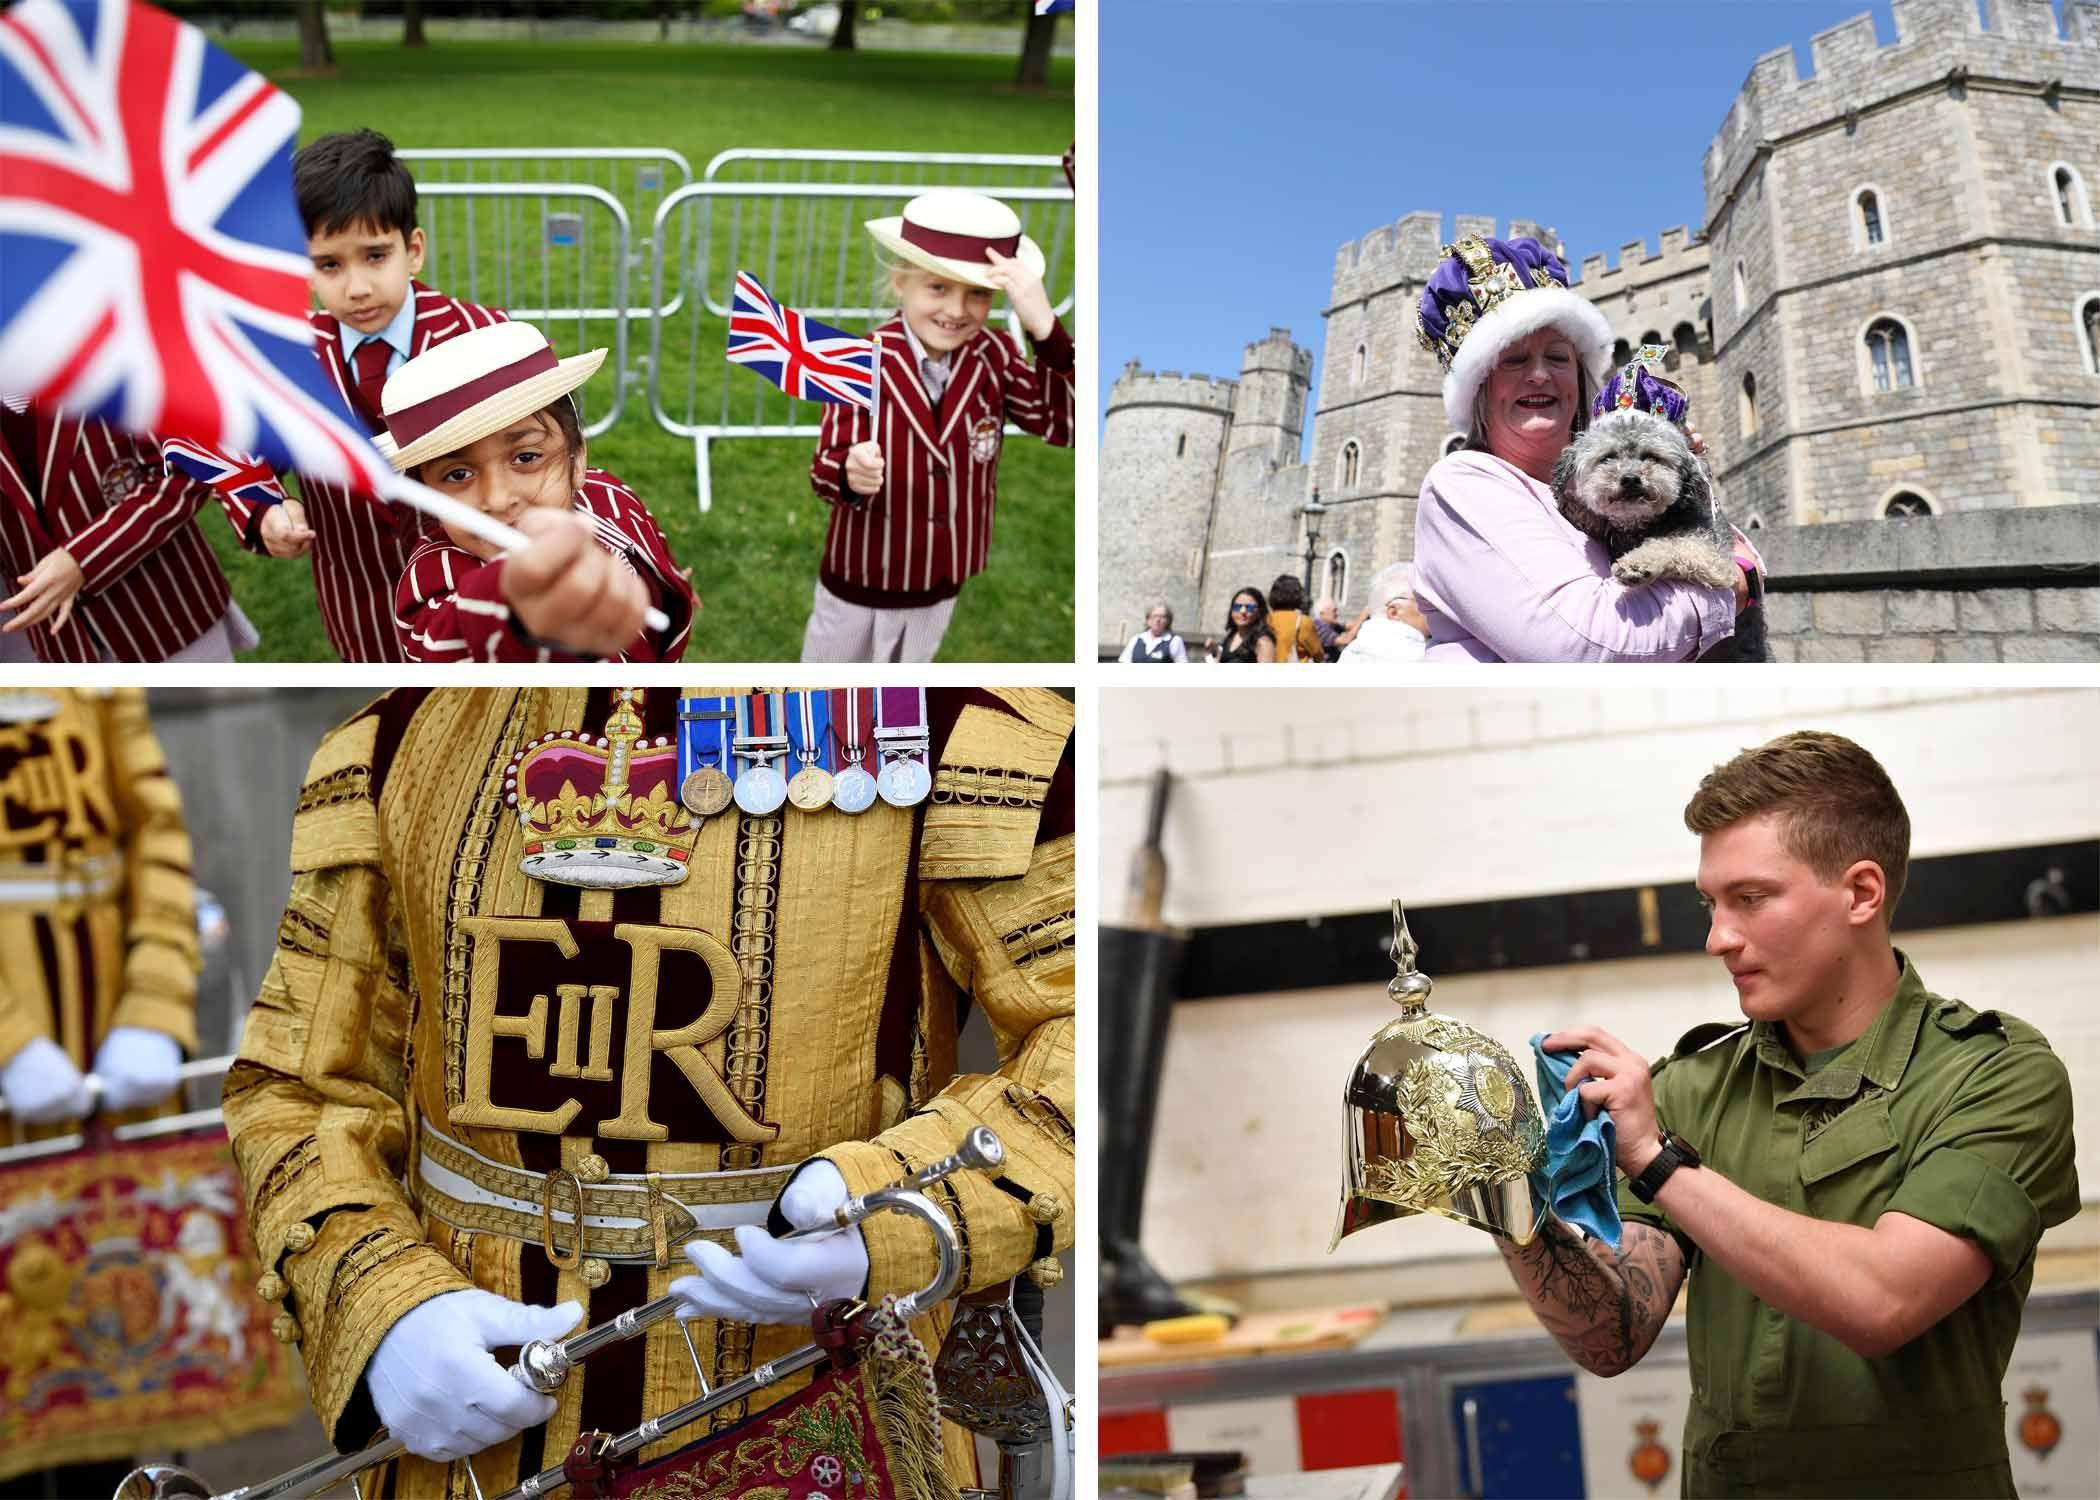 Meghan Markle's Wedding Day 2018 Photos: England Prepares for Prince Harry and Meghan Markle's Royal Wedding